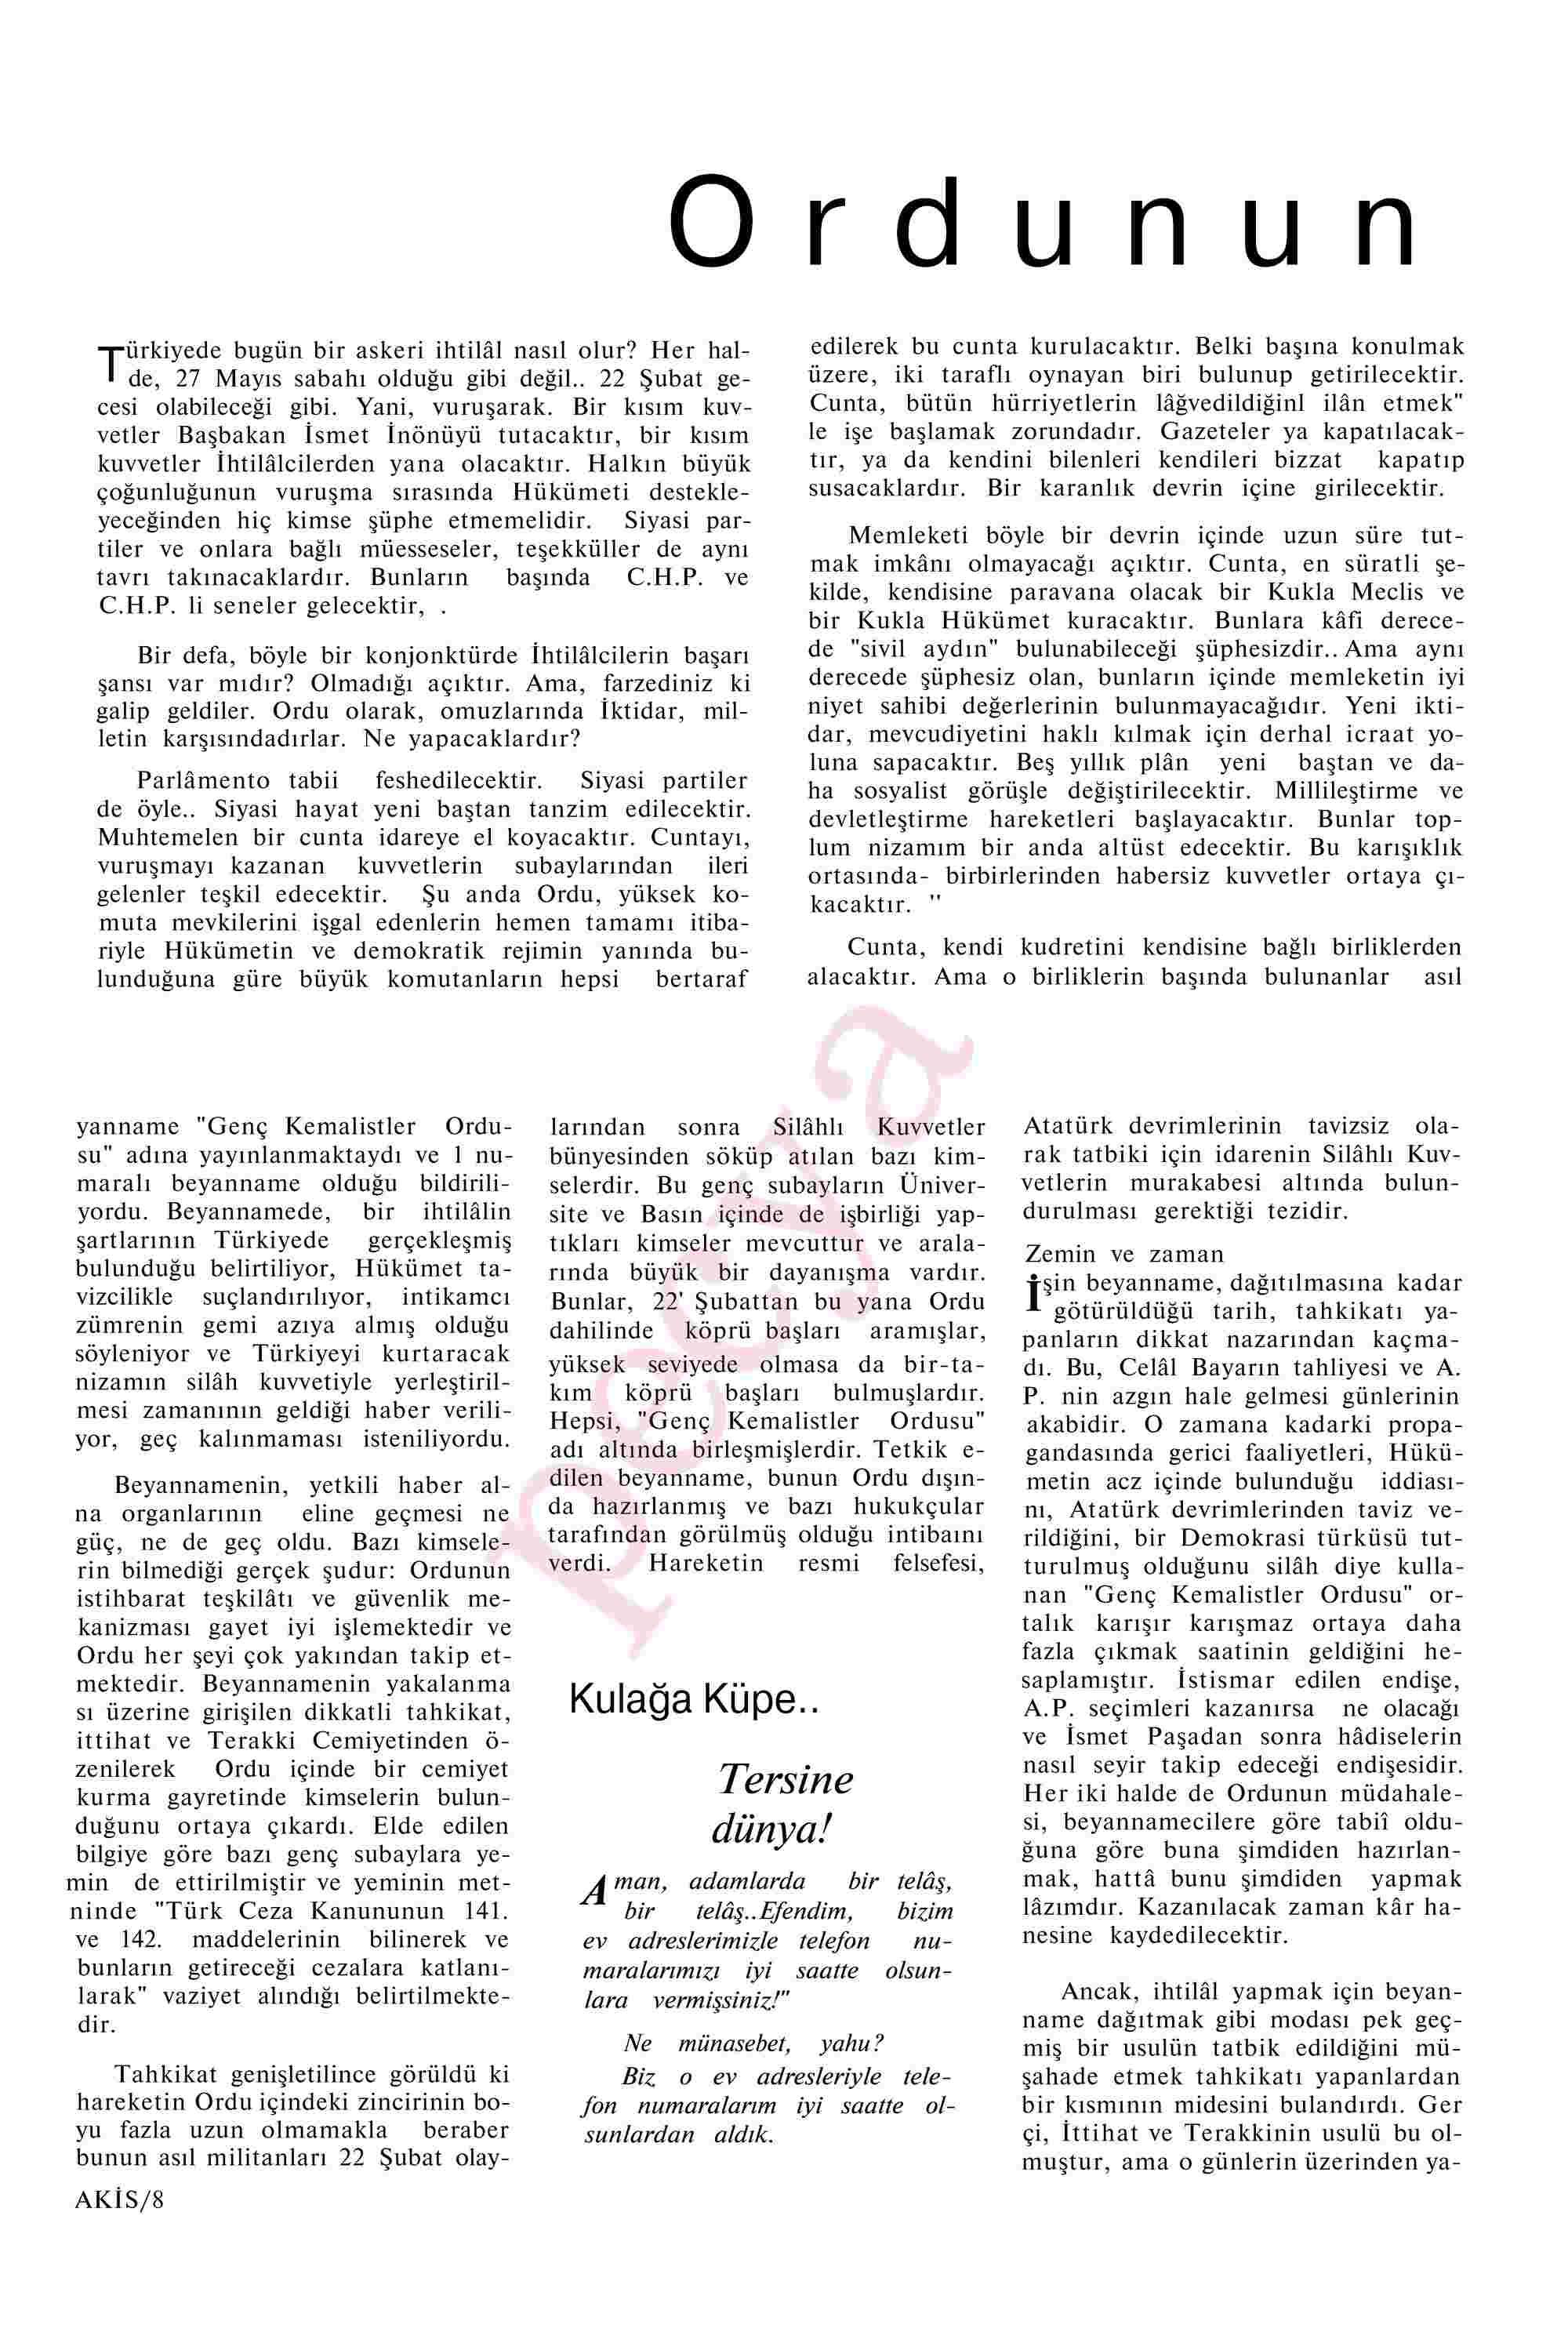 27 Nisan 1963 Tarihli Akis Dergisi Sayfa 8